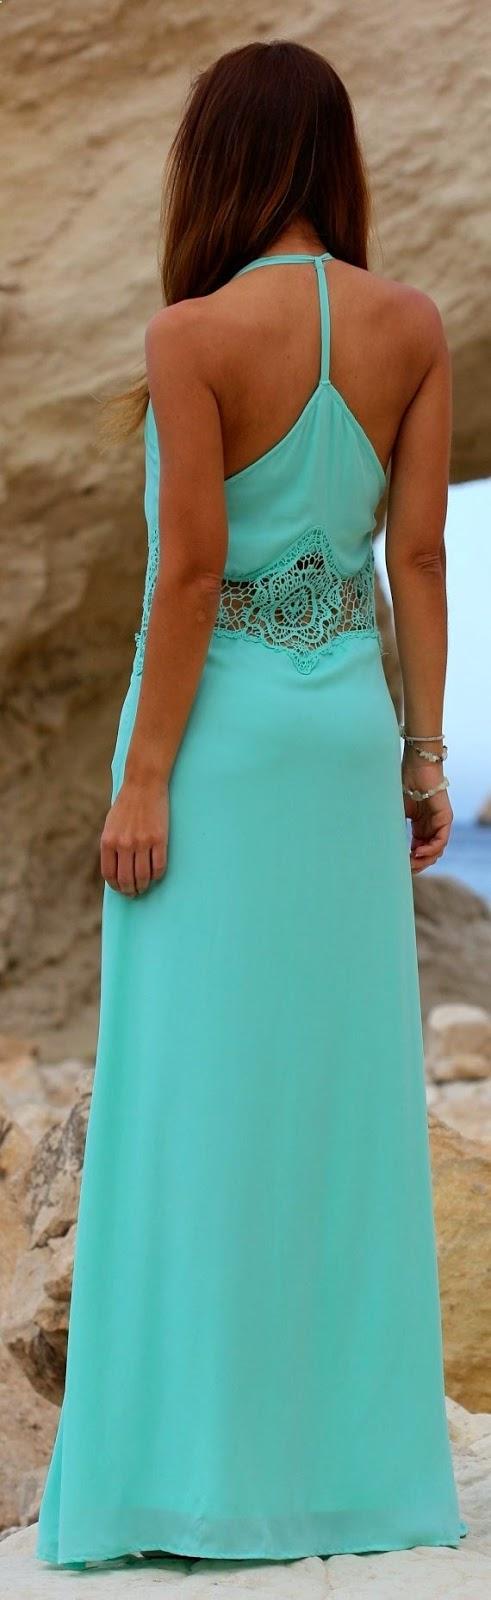 The Vogue Fashion: Mini Back Detail Neck Hold Maxi Dress | Dress it ...